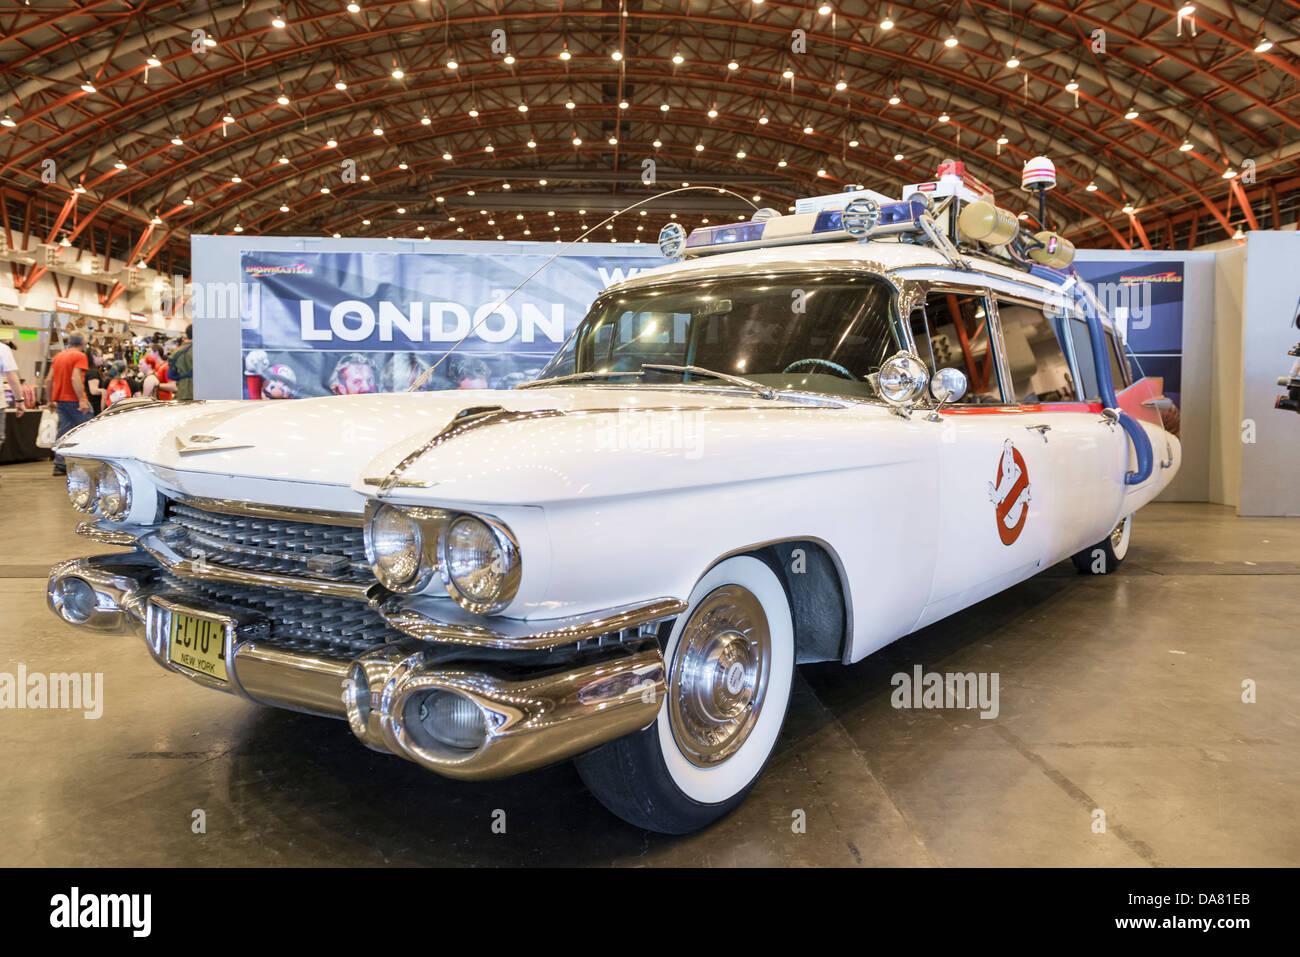 Uk Ghostbuster Car